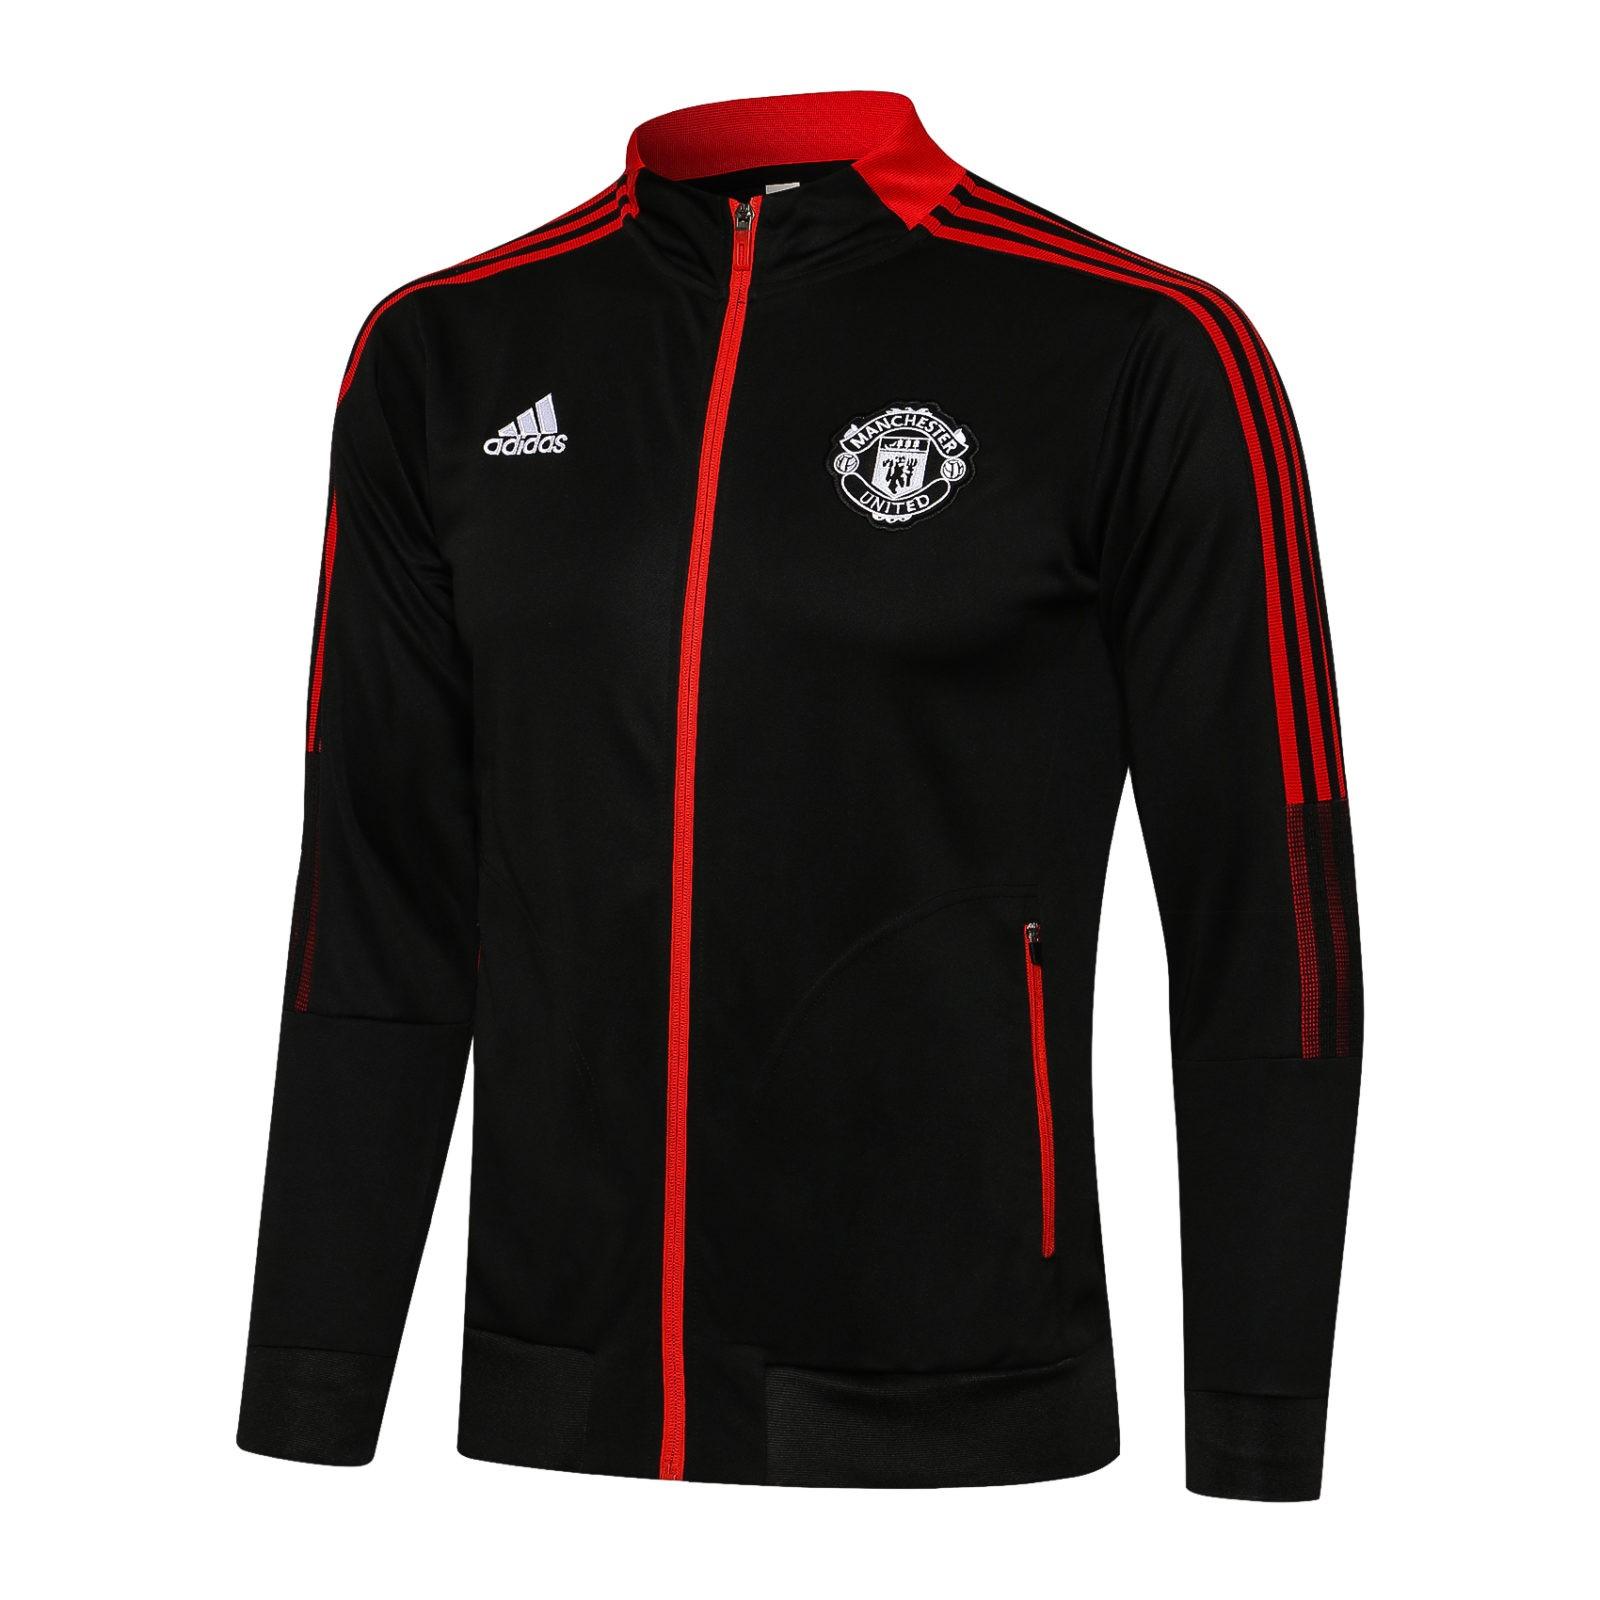 Олимпийка Манчестер Юнайтед сезон 2021-2022 (Чёрная 2)